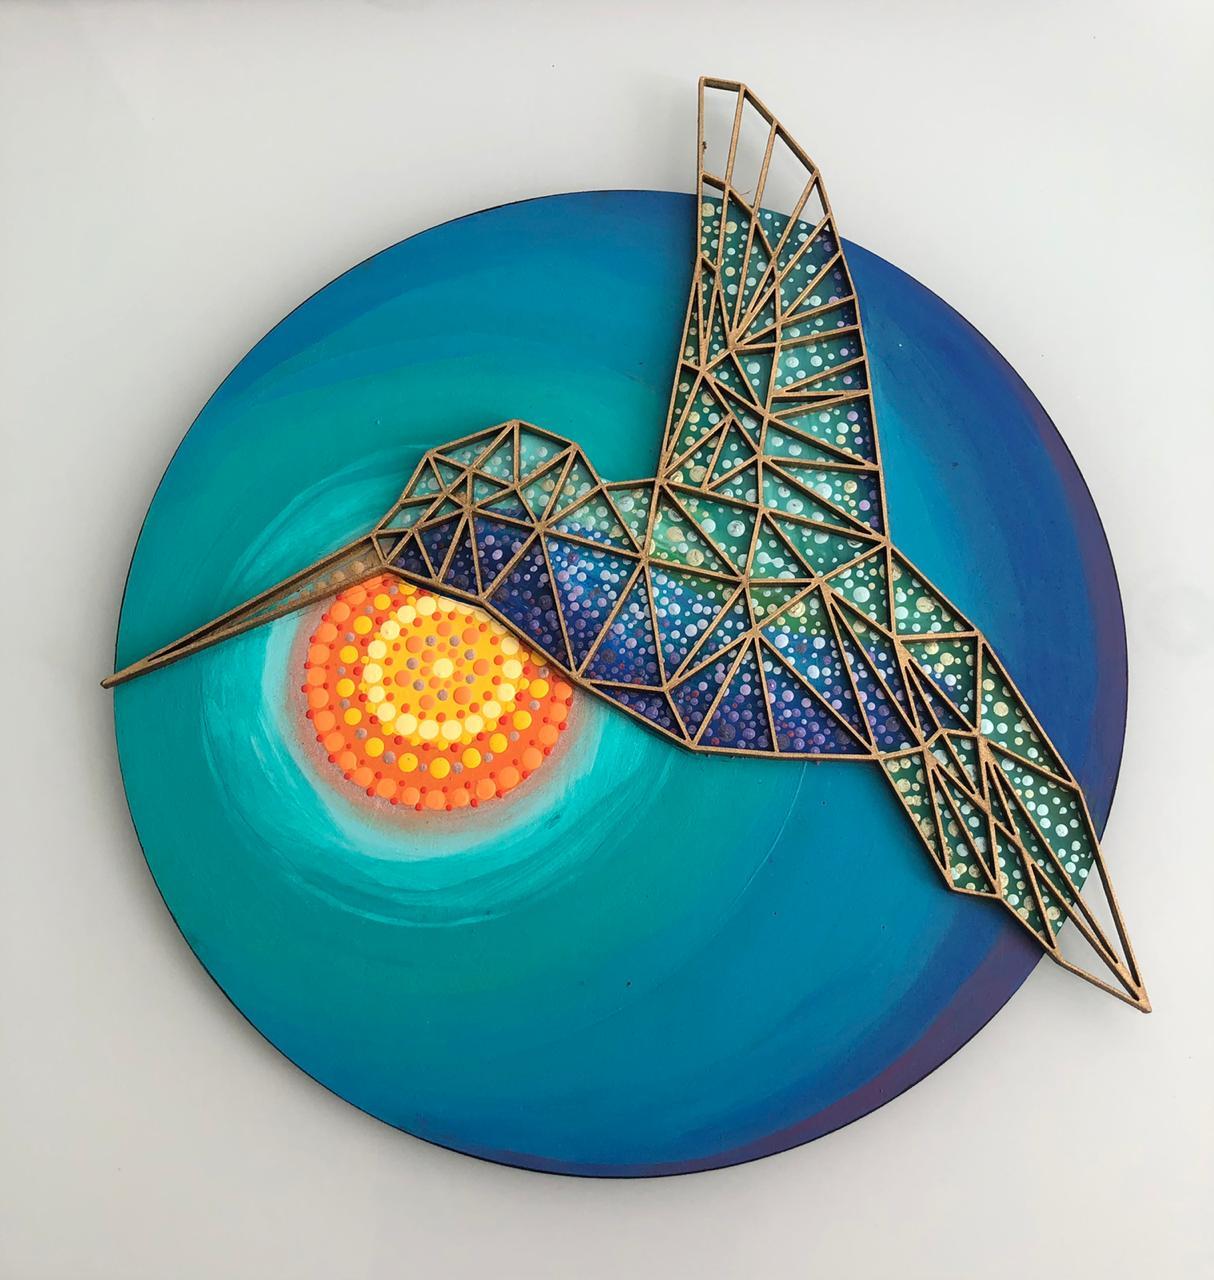 colibri-amanecer-osaya-joya-artesanal-mexico-BOA130-geometria